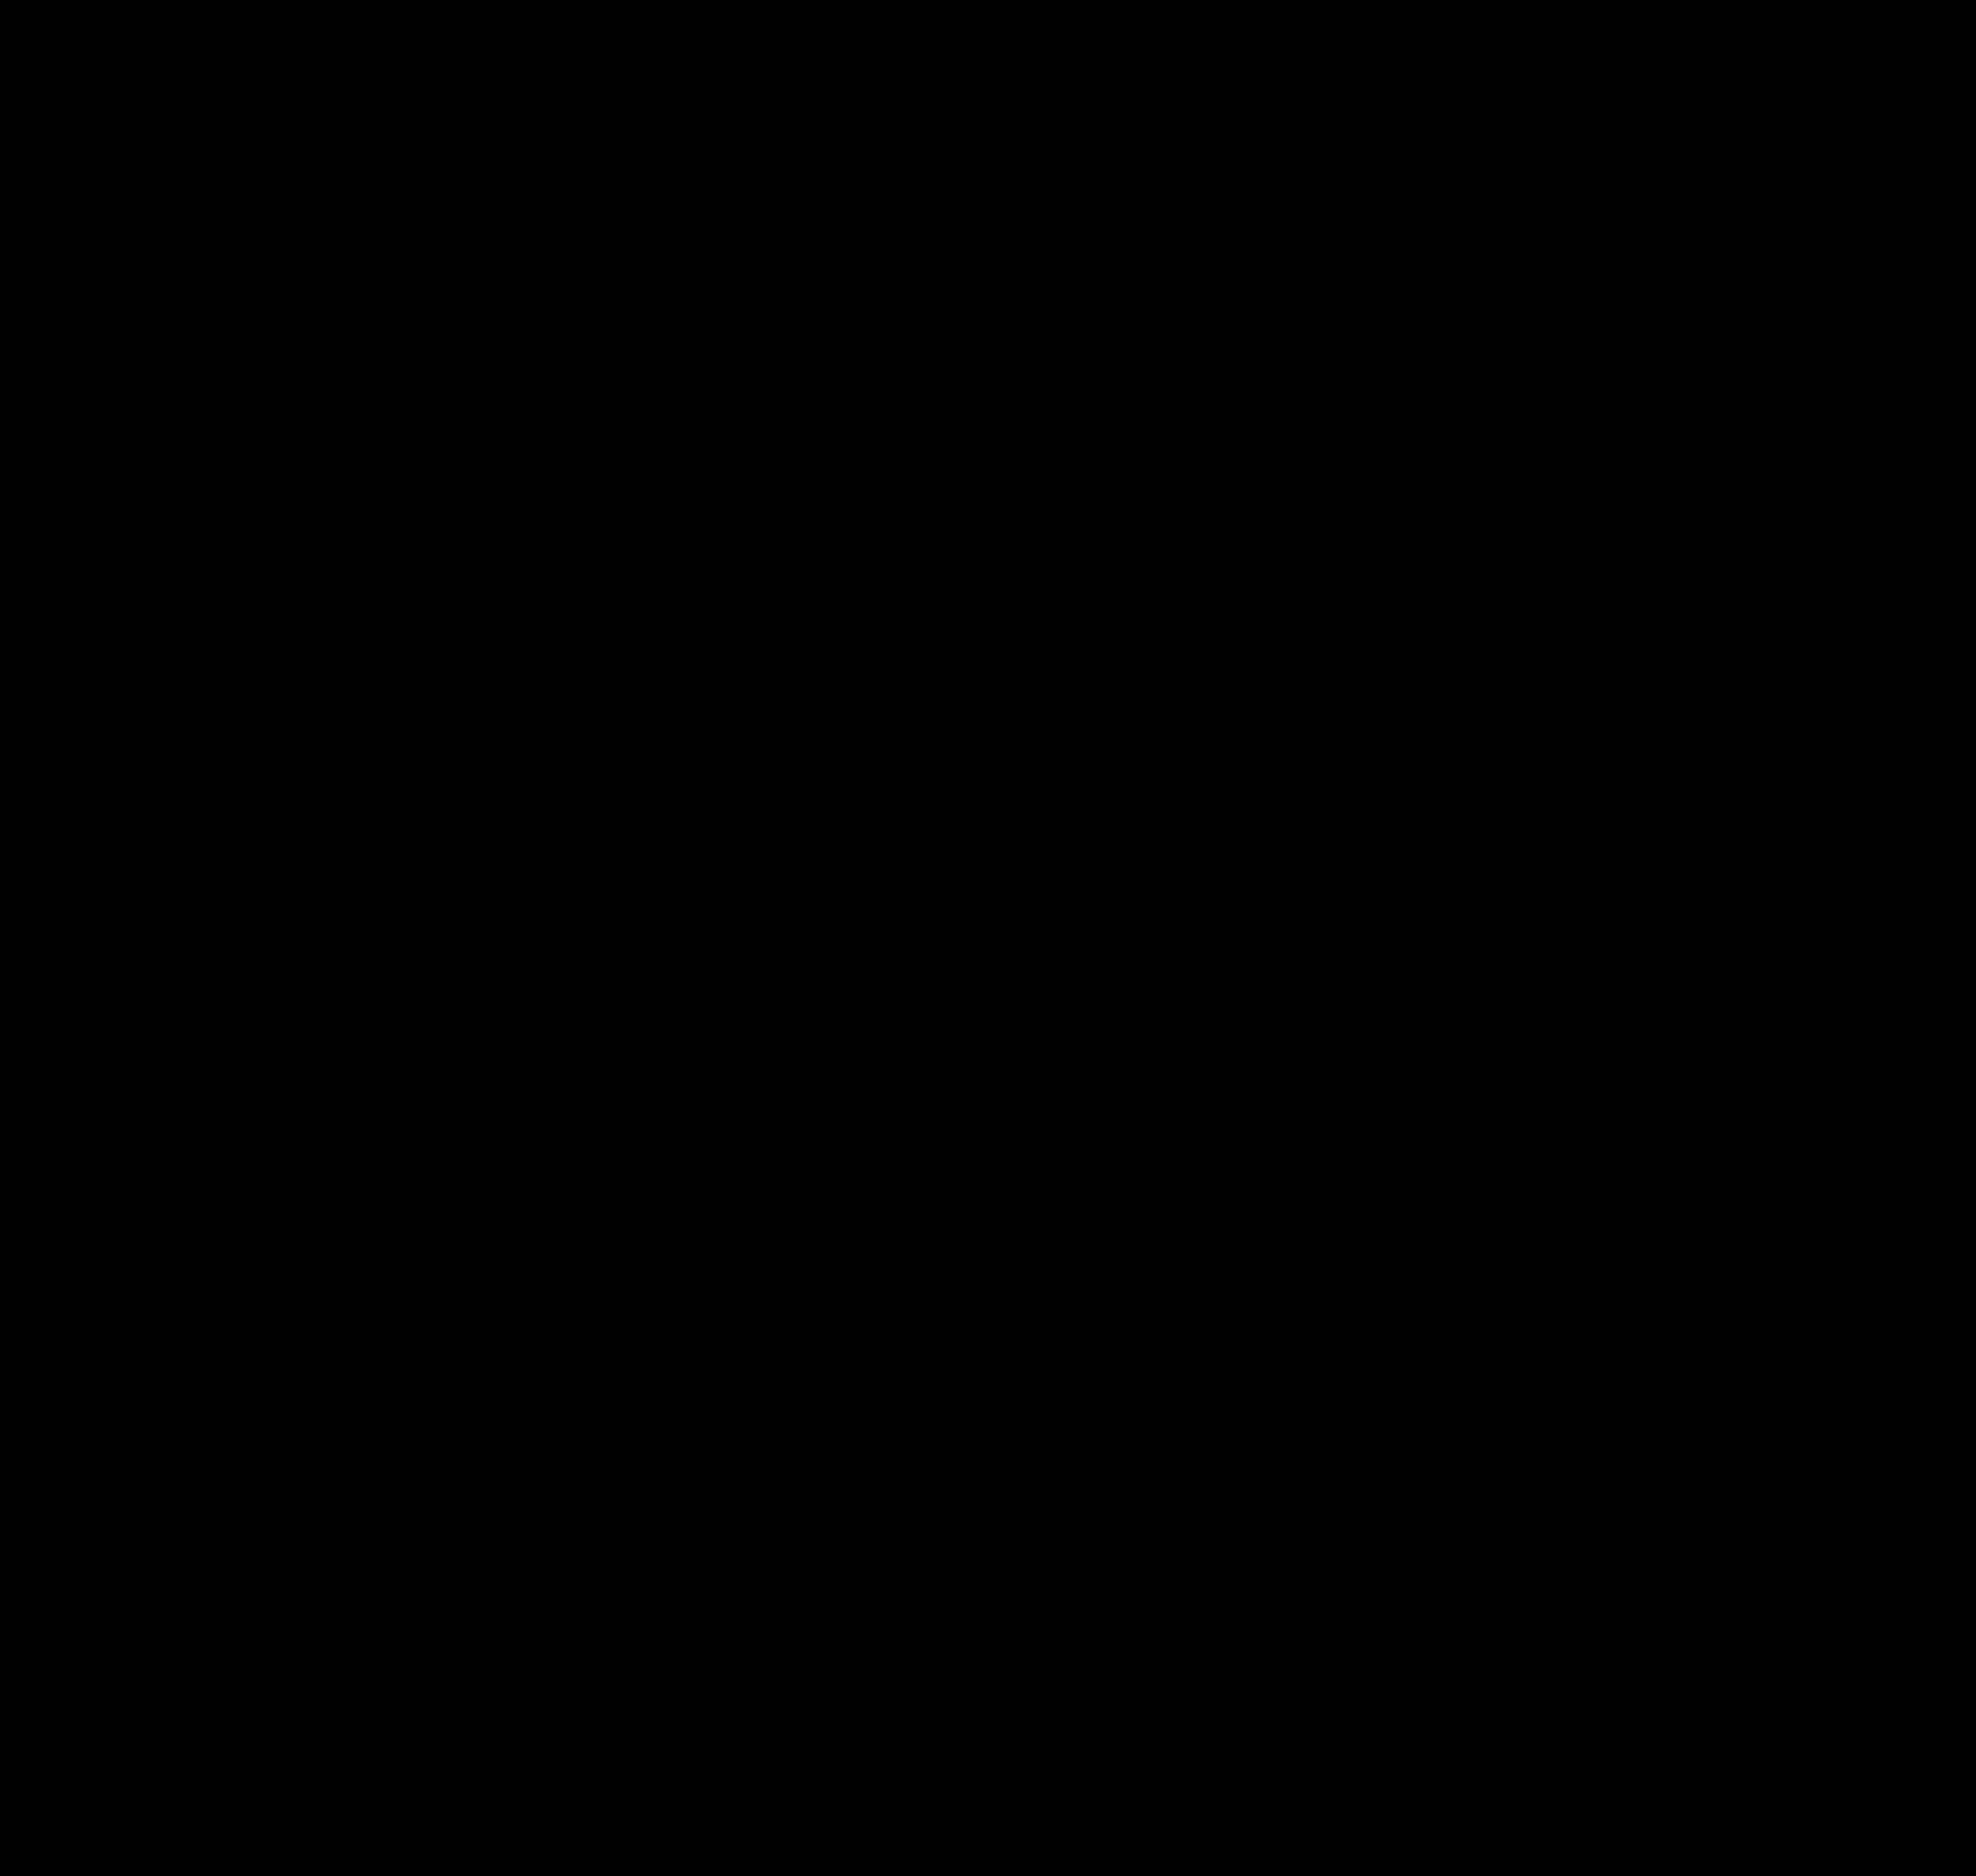 2400x2278 Christmas Tree Silhouette Clipart